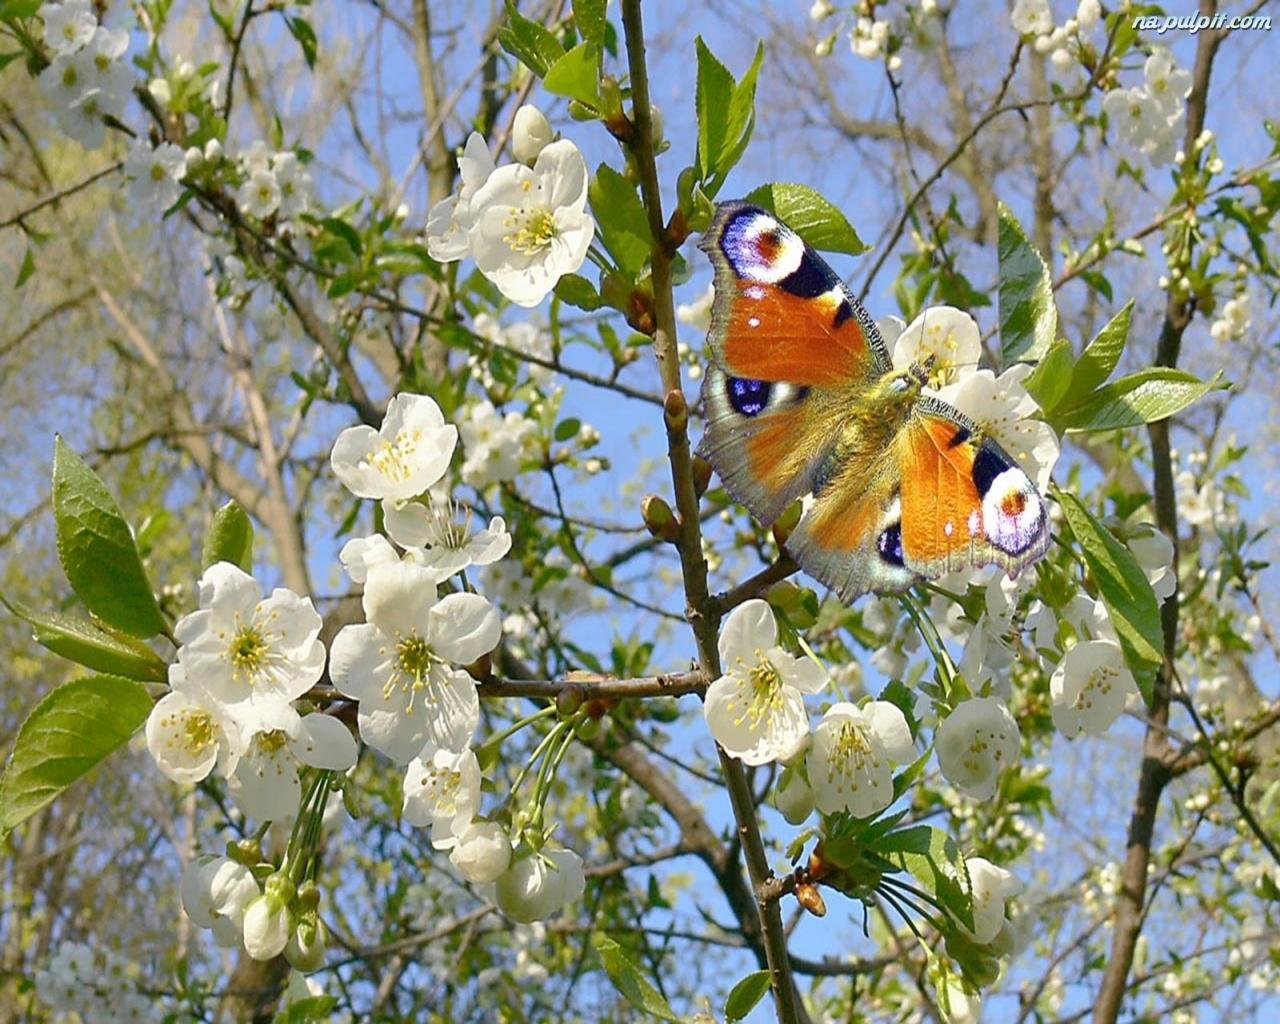 Фото на рабочий стол весна природа  DreemPicscom